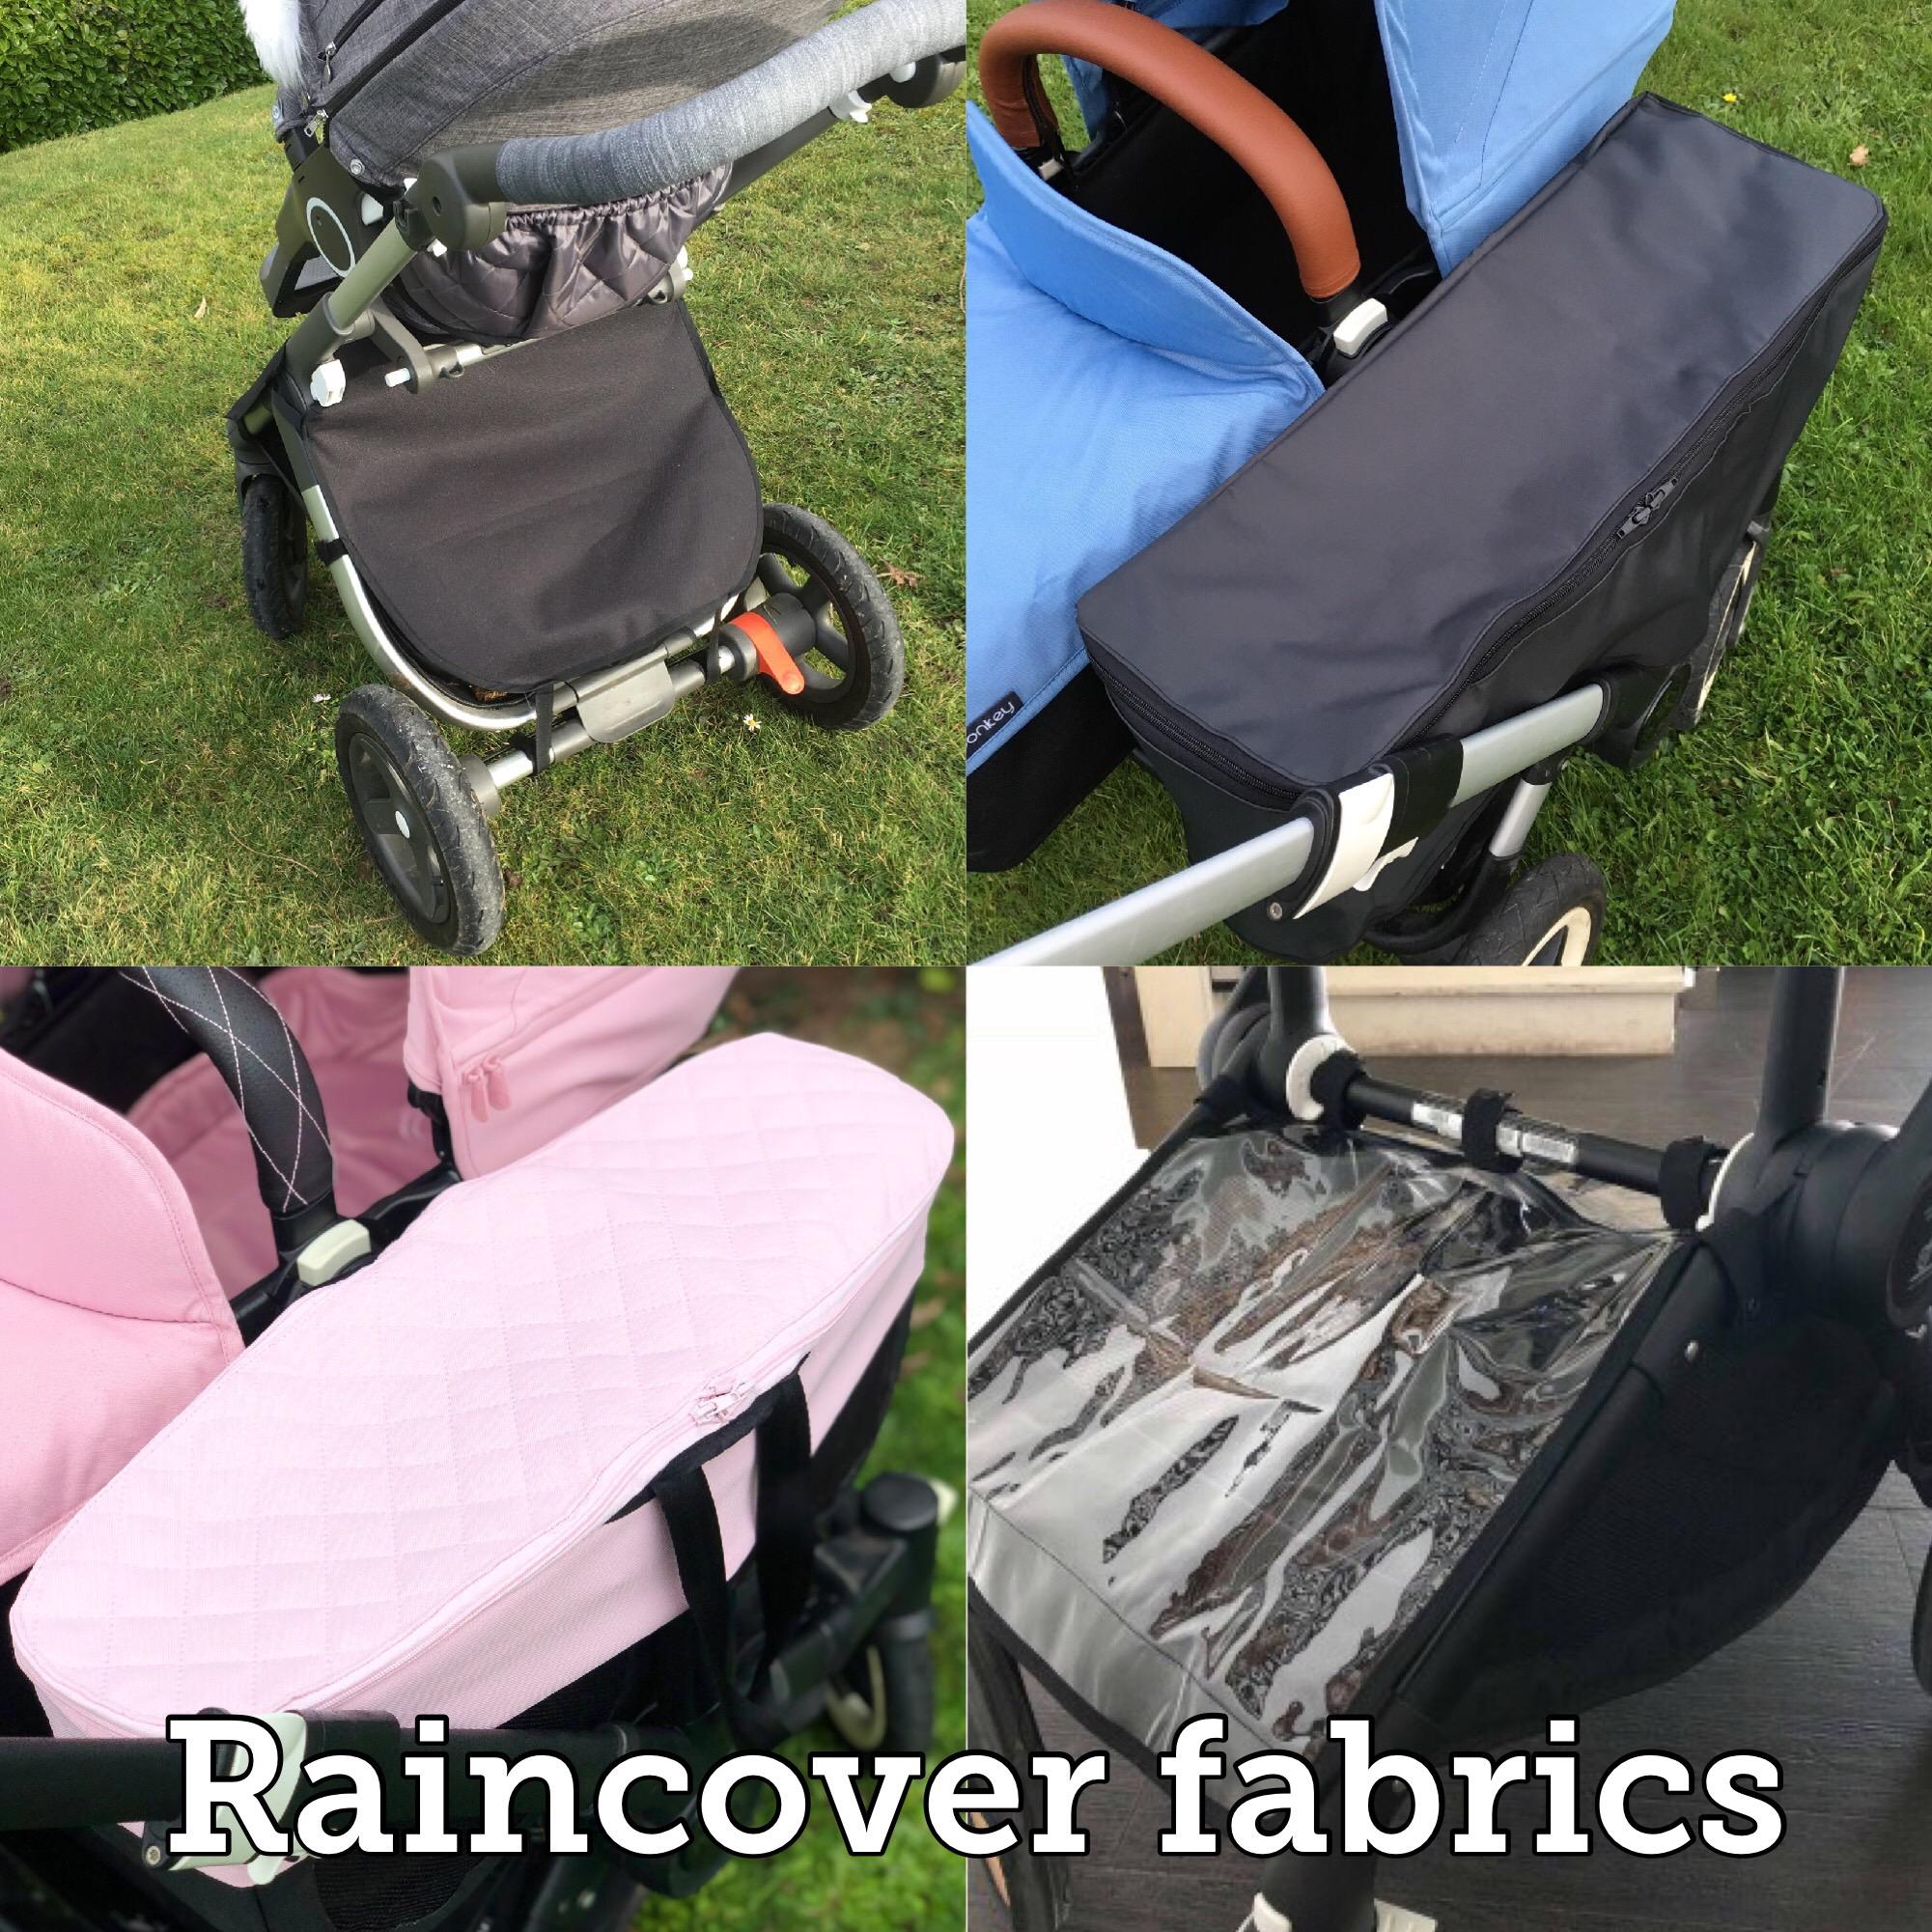 Raincover Fabrics